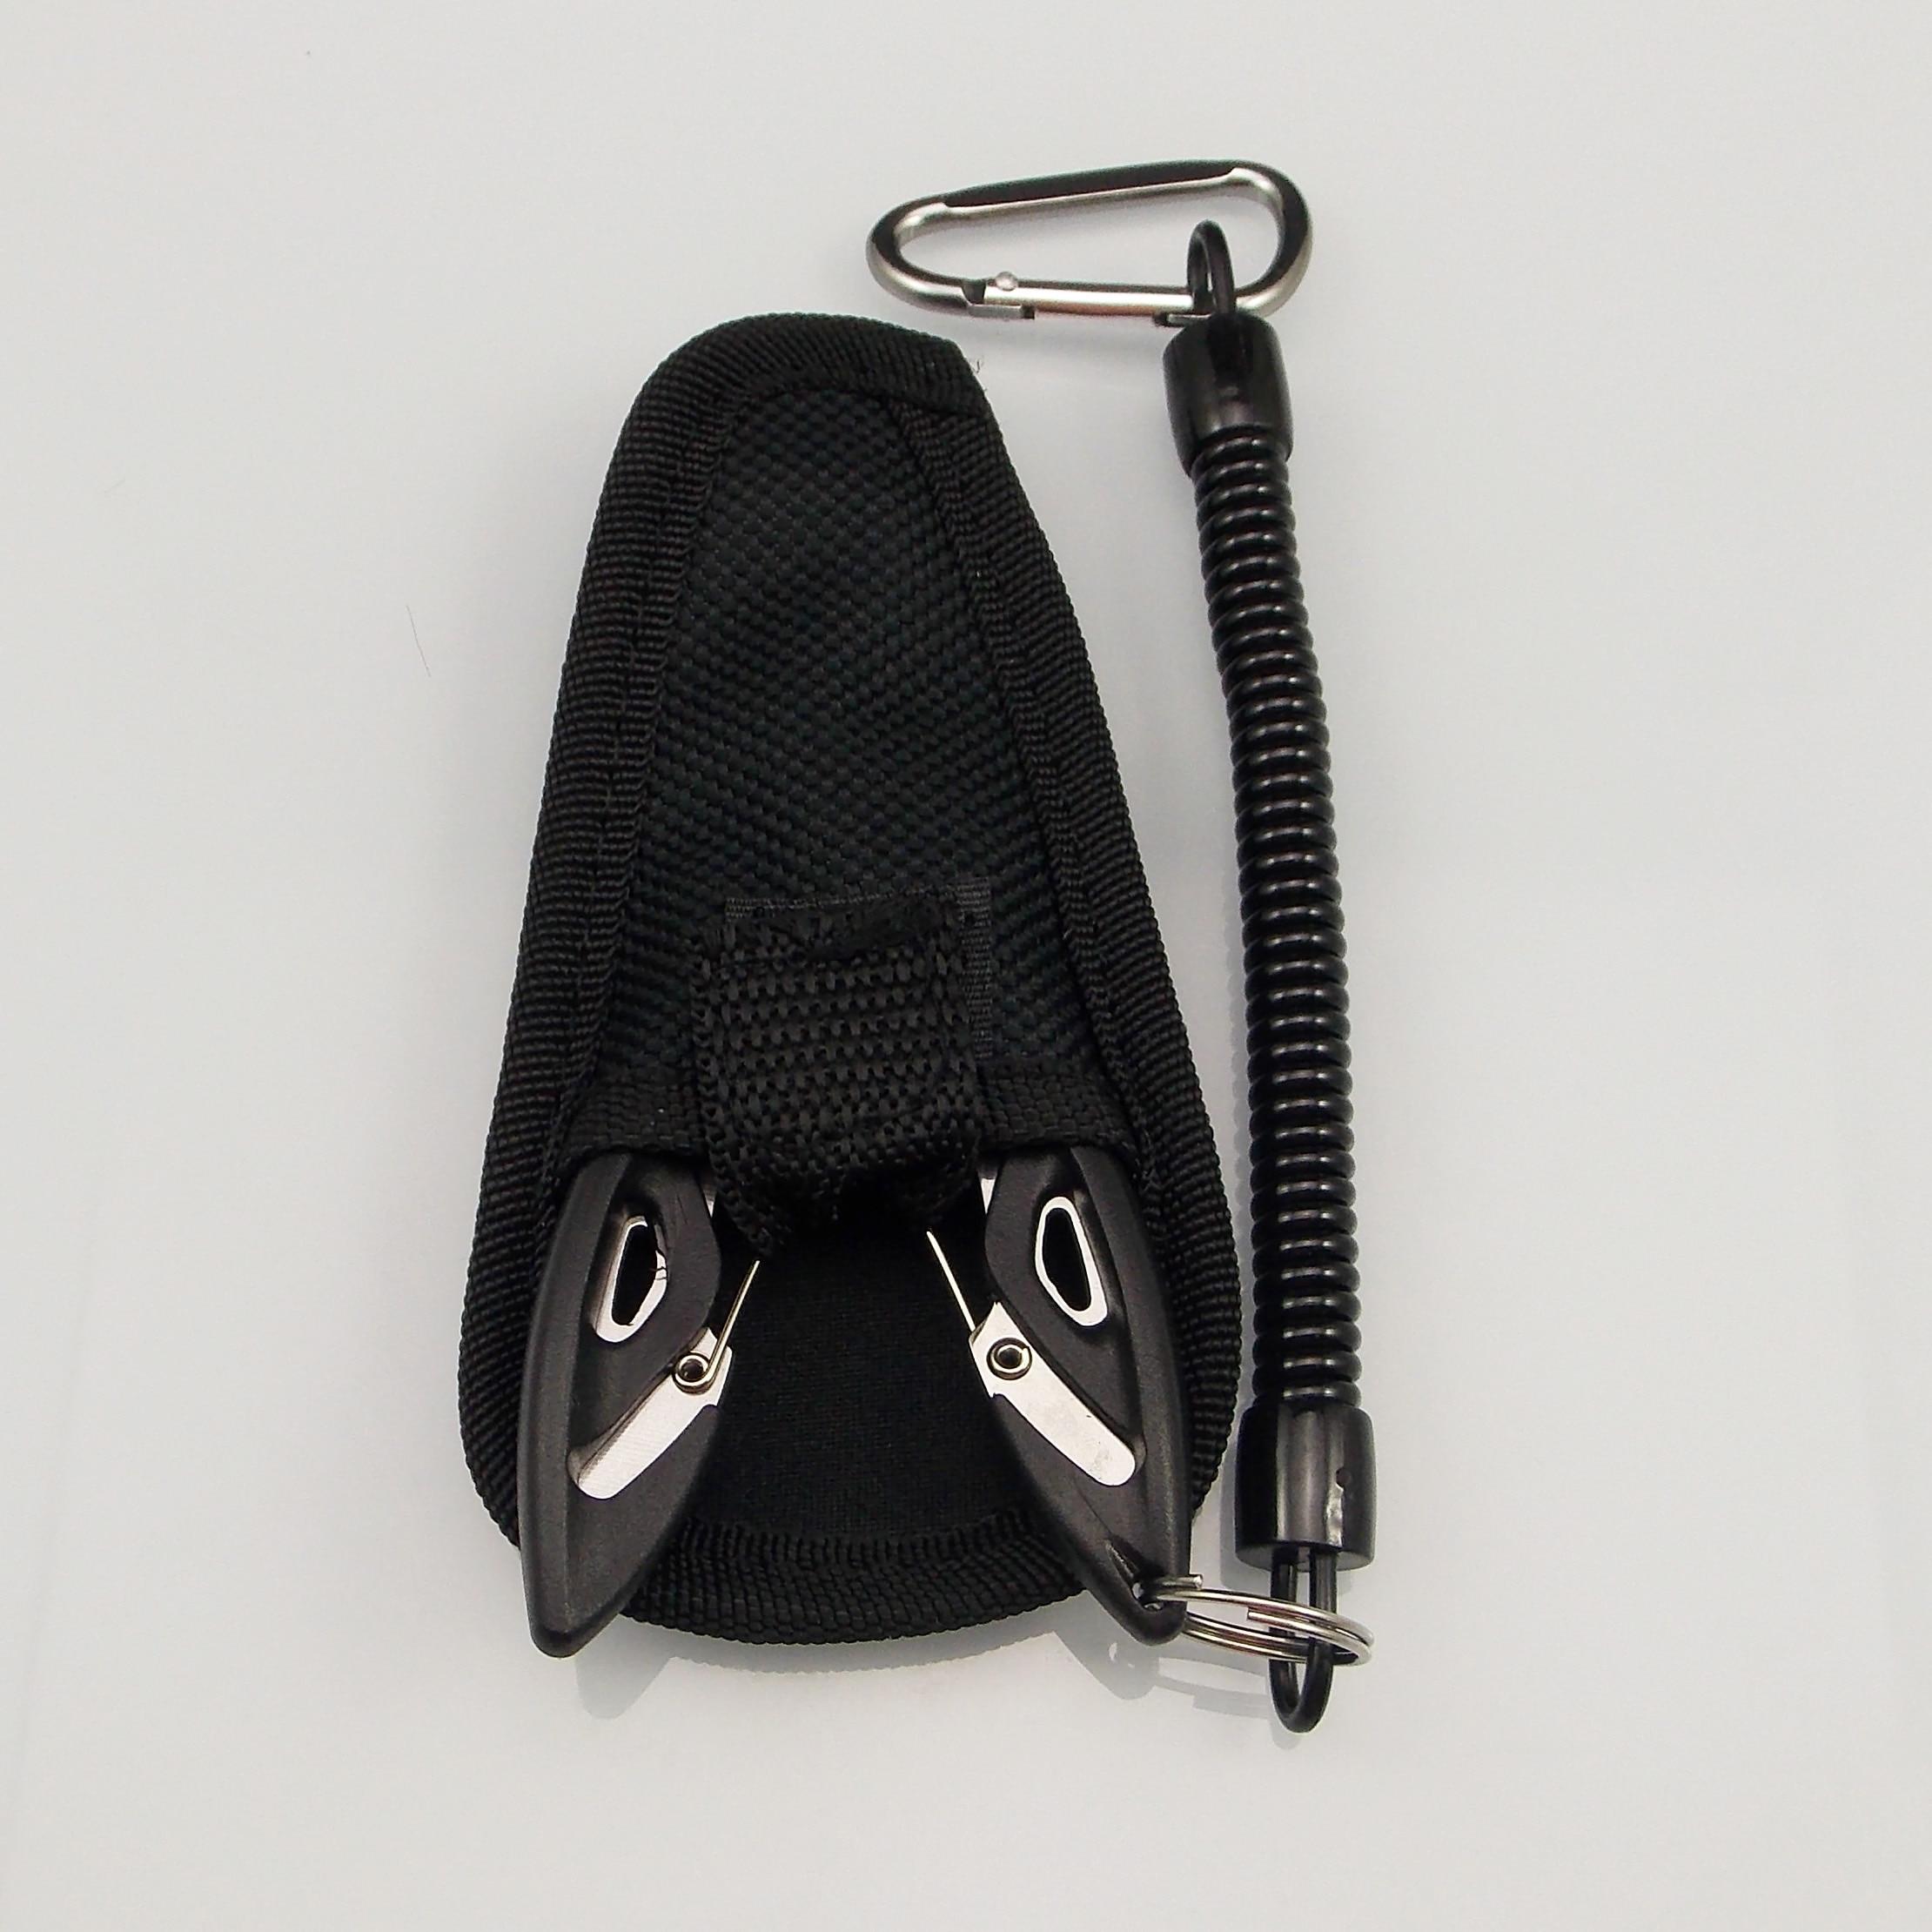 KESFISHING Fishing Multifunctional Plier Camping Secure Pliers Clip Lip Grips Fishing Tools